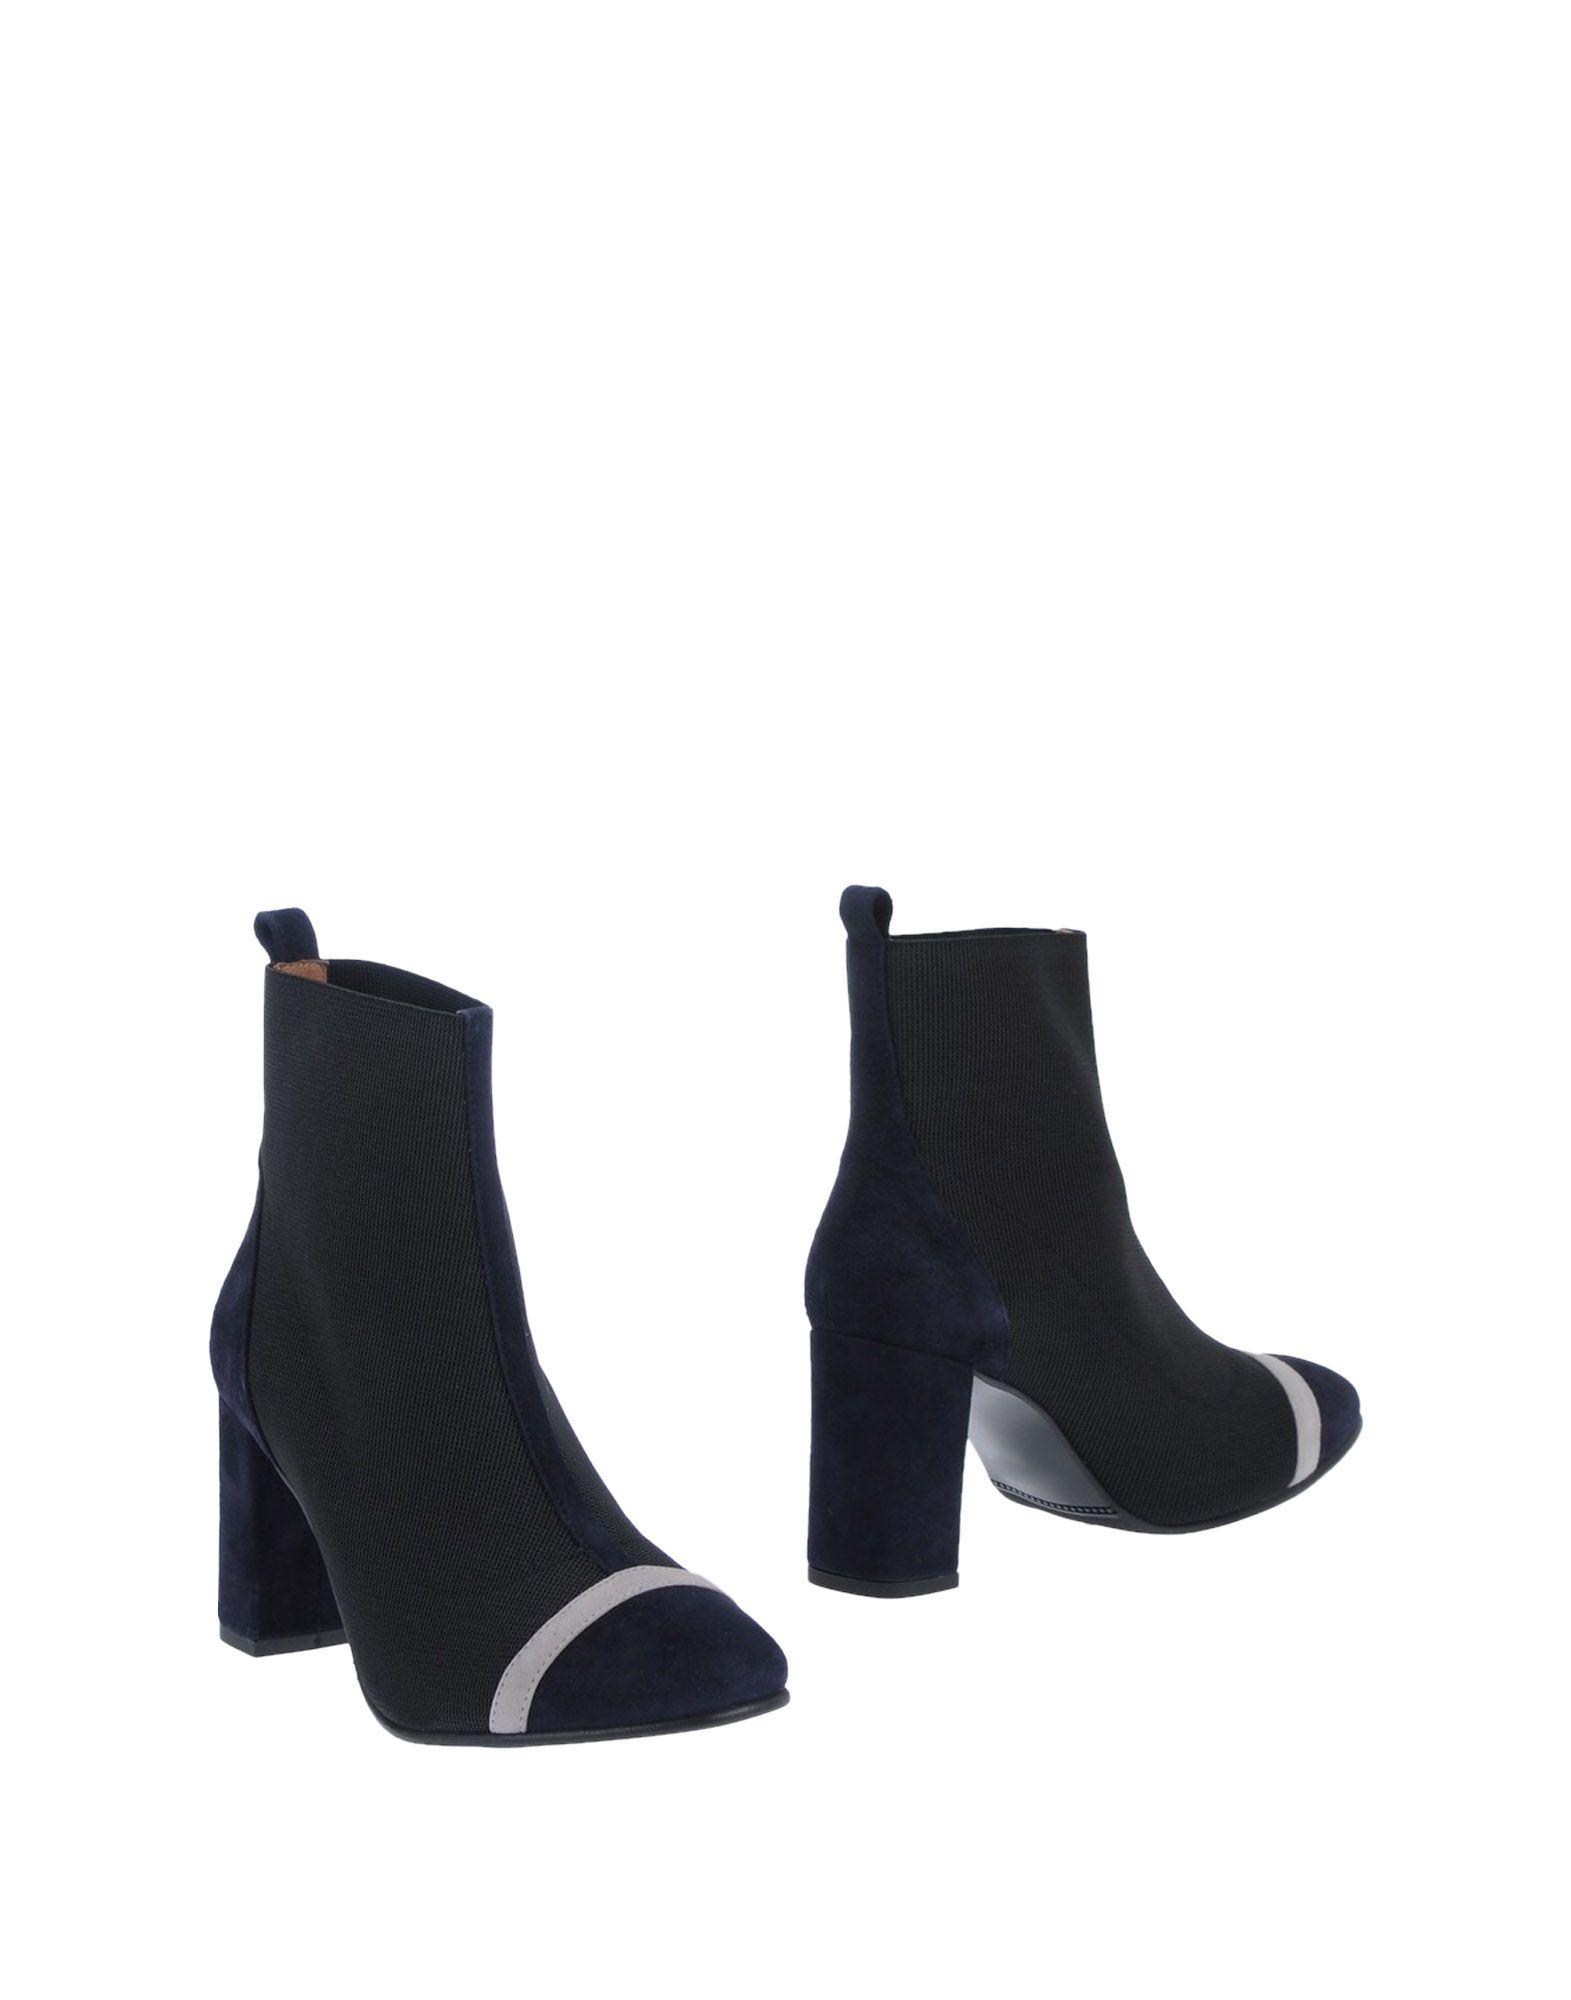 Moda Stivaletti Ancarani Donna - 11507638ES